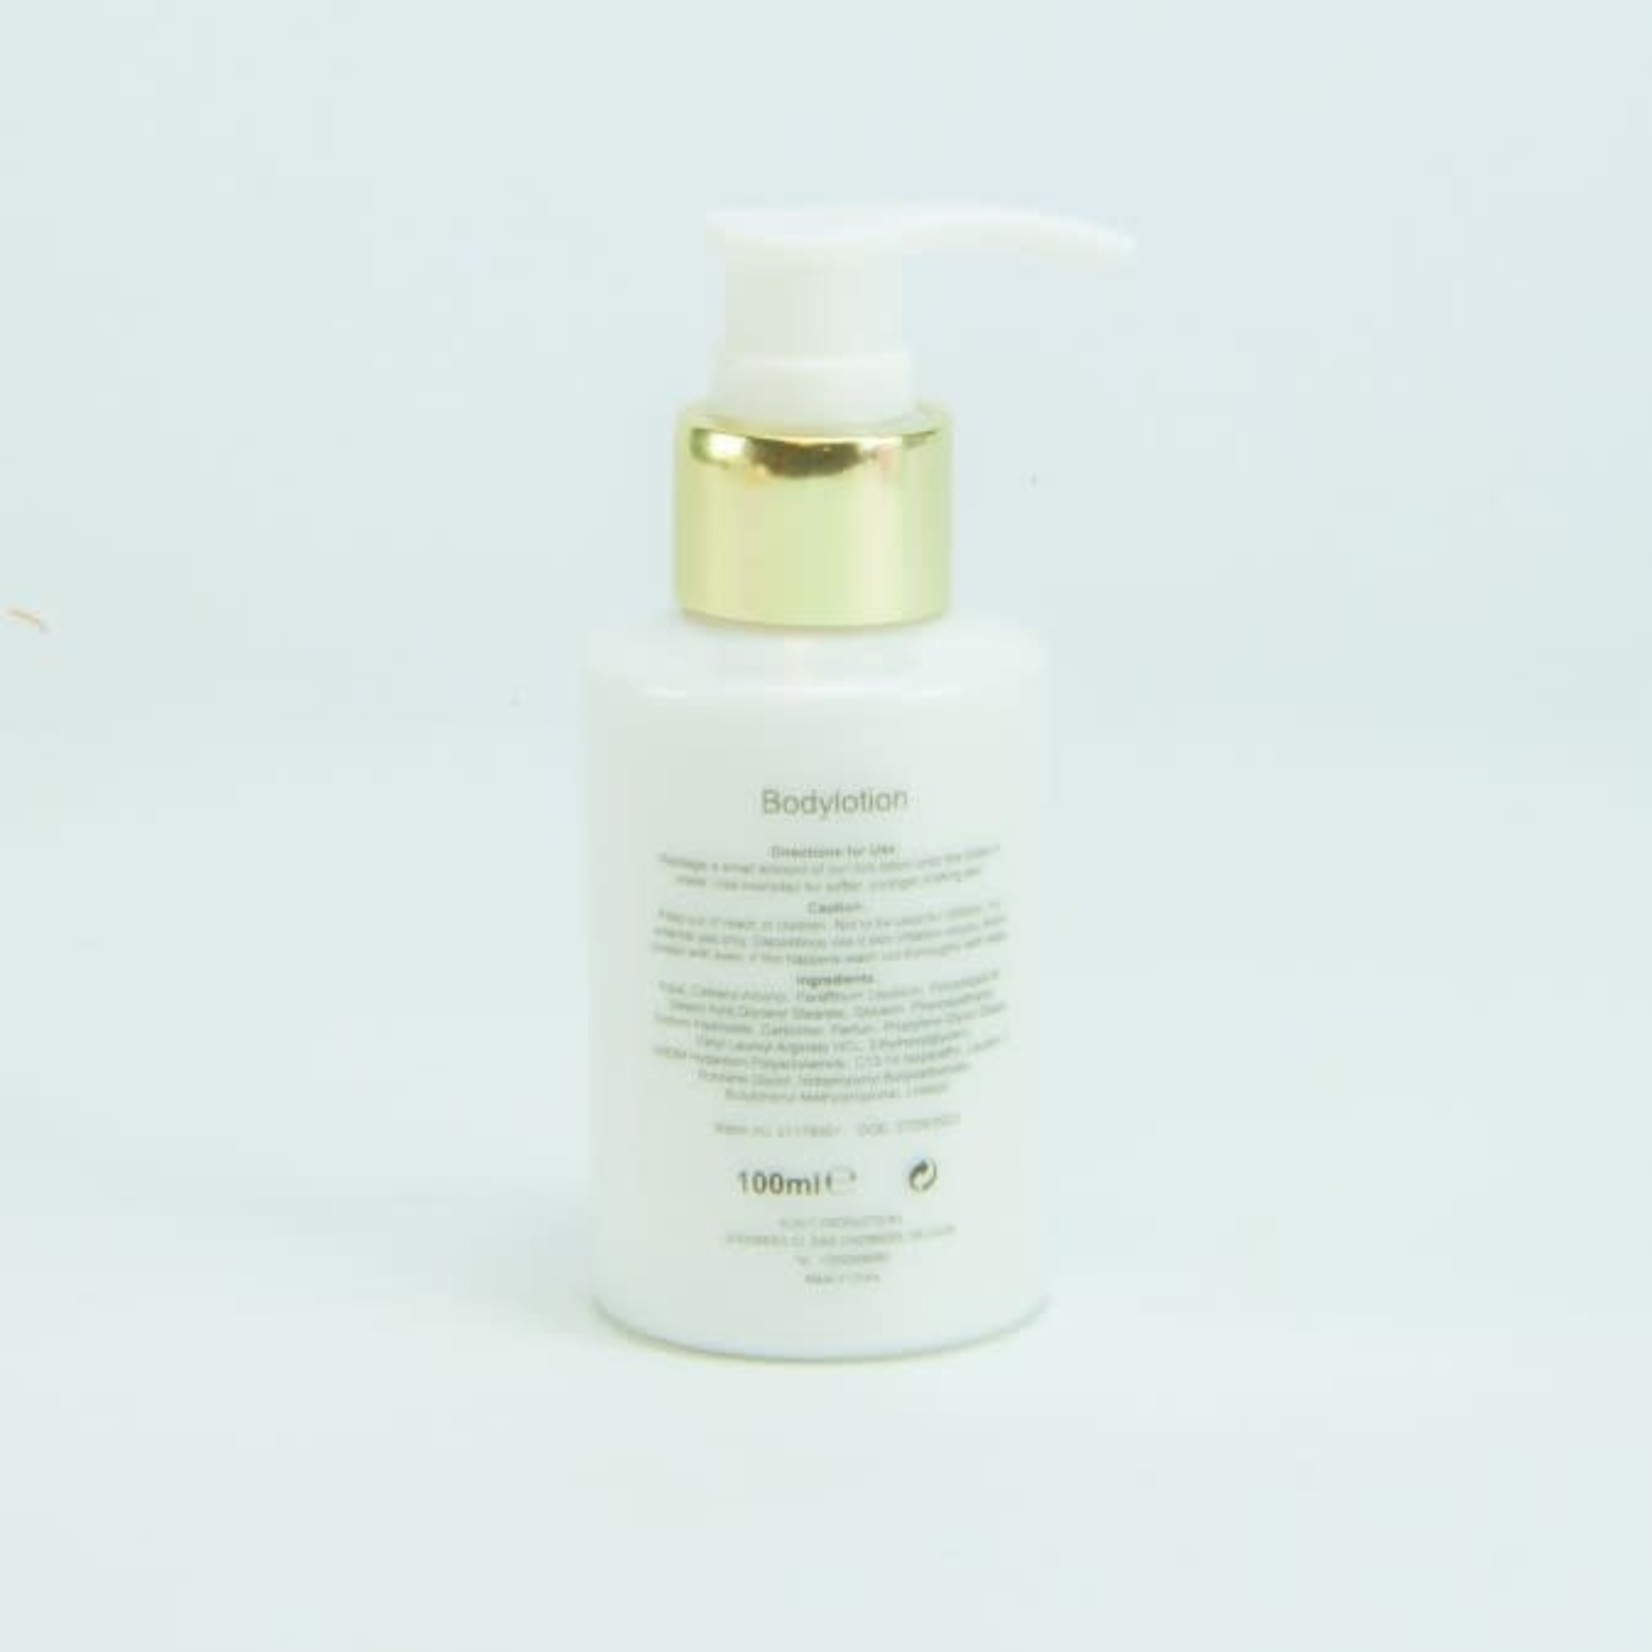 Elaut Body lotion met metallic gouden pompje - 100 ml